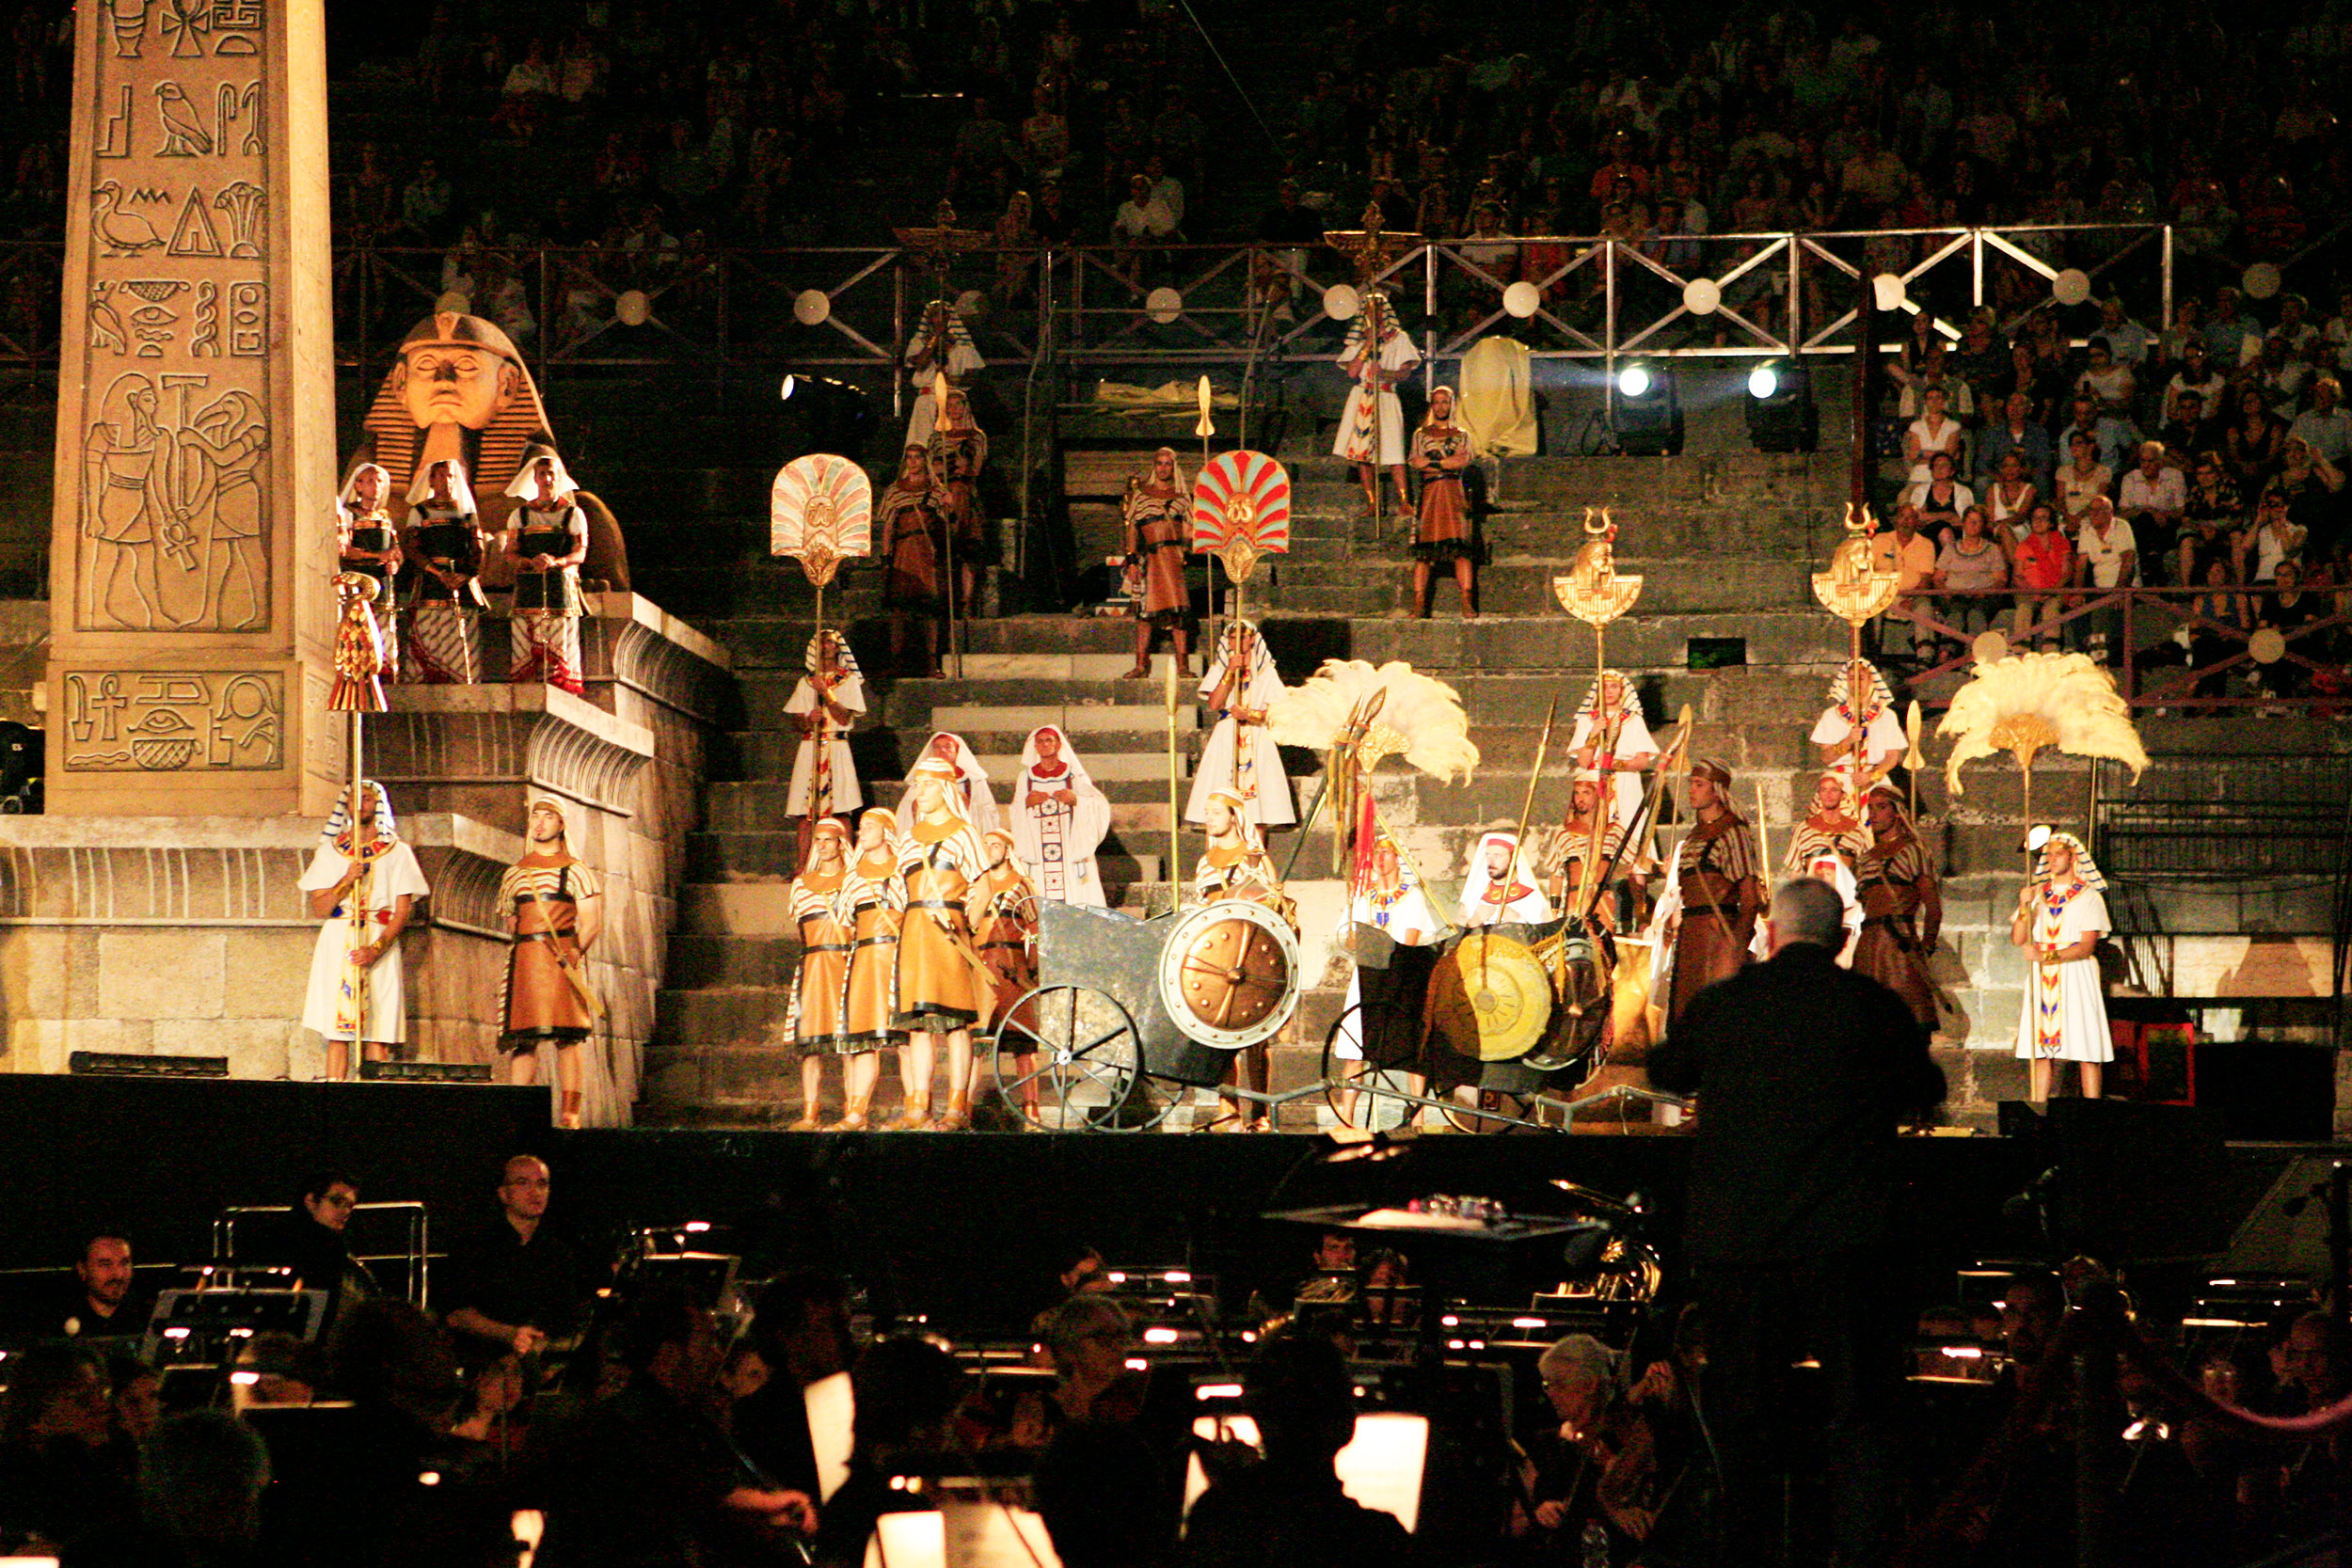 Front row seats at the Arena di Verona opera